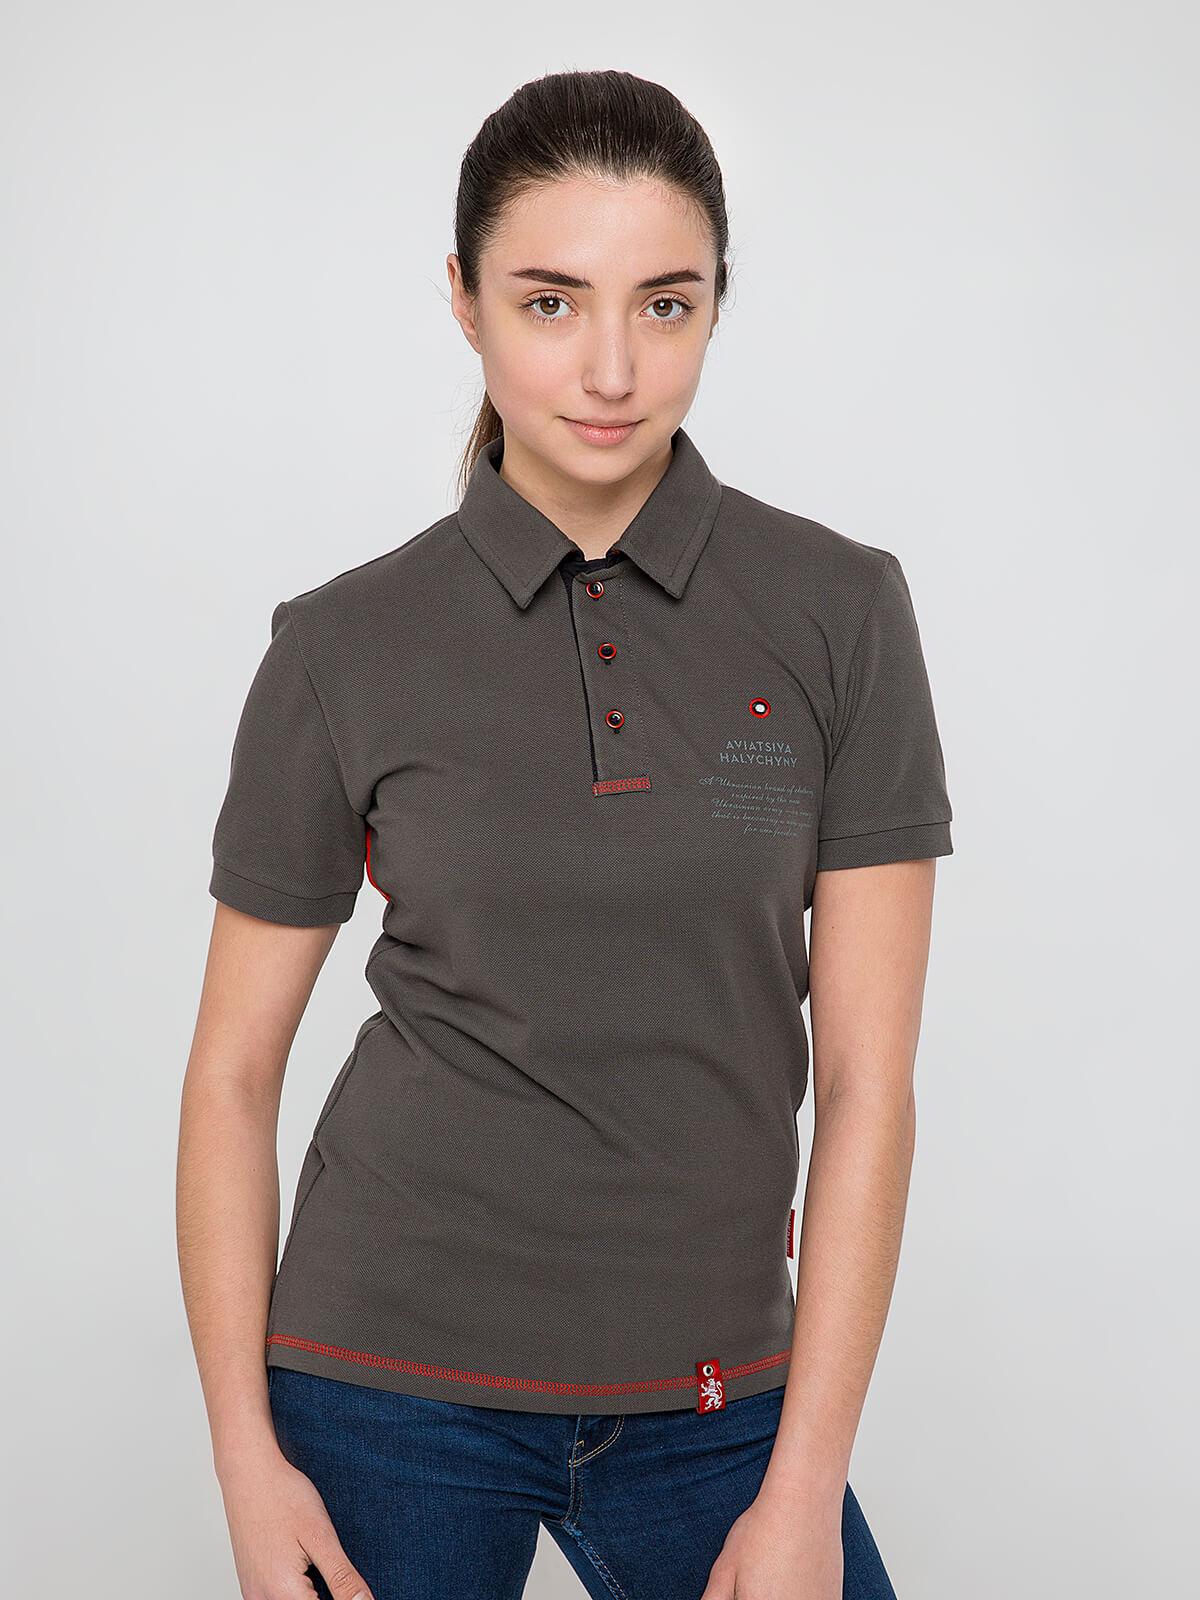 Women's Polo Shirt Wings. Color khaki brown. Unisex polo (men's sizes).